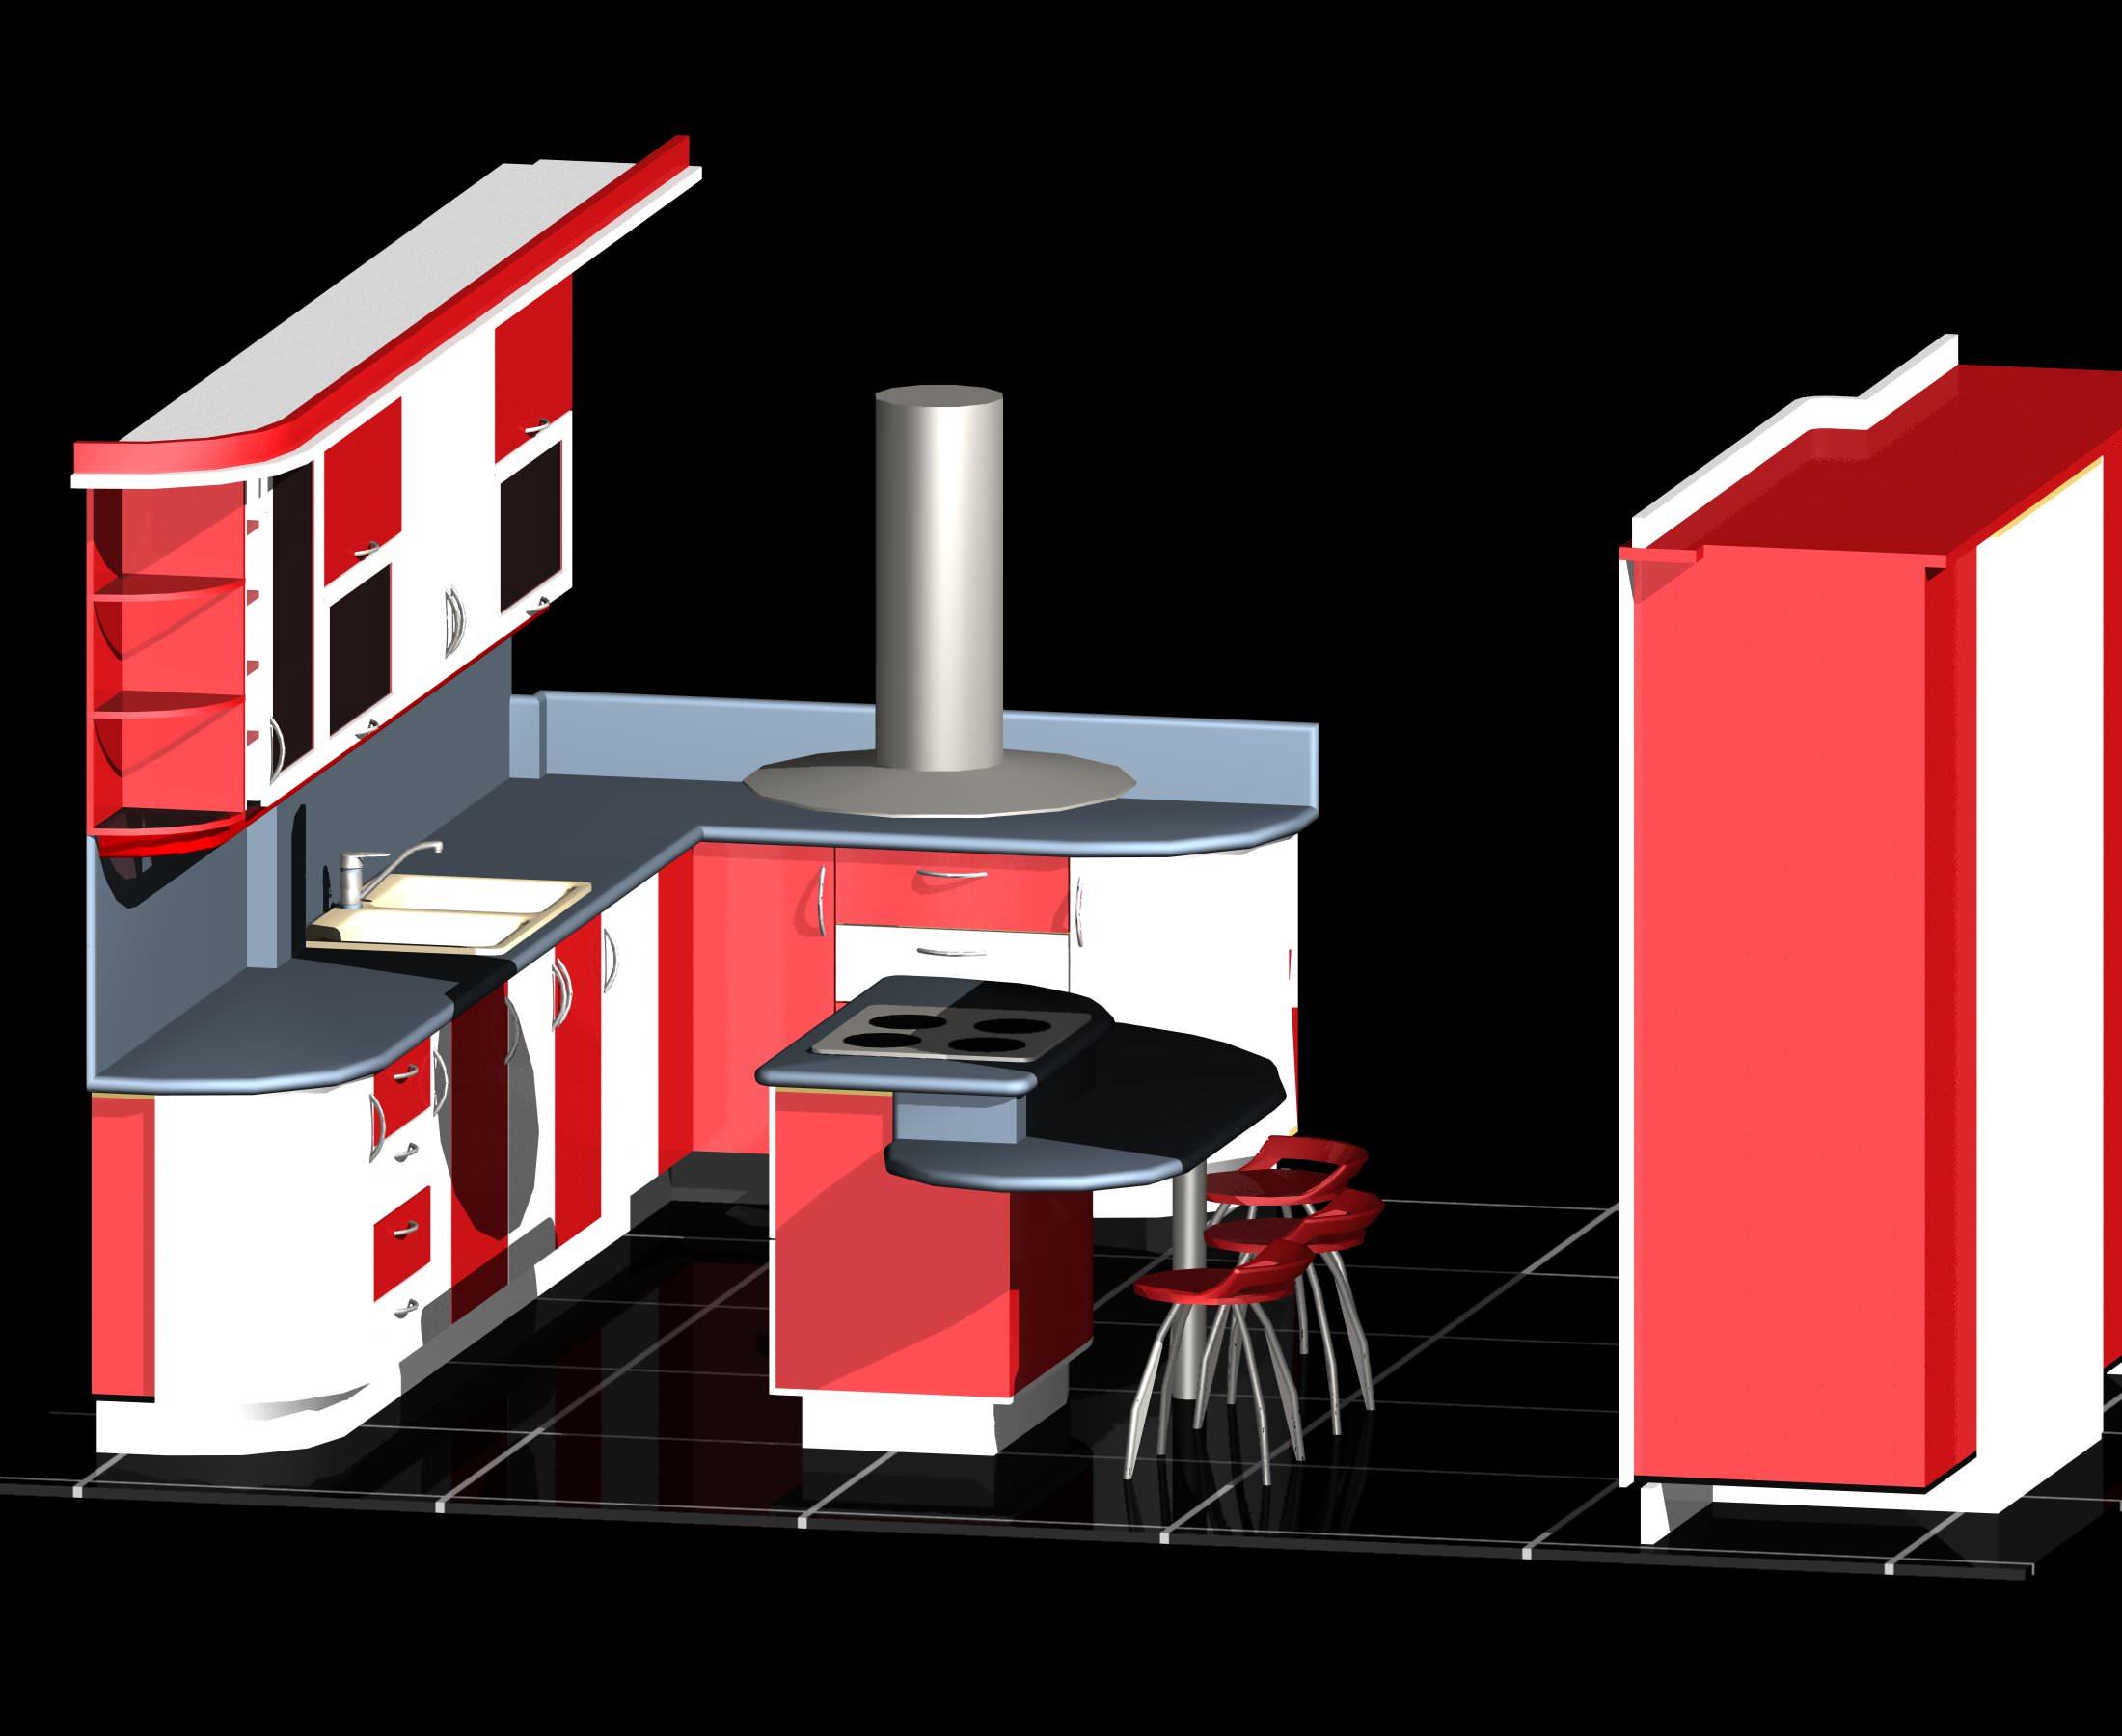 Modular Kitchen Auto Cad 3d Free 3d Model Dwg